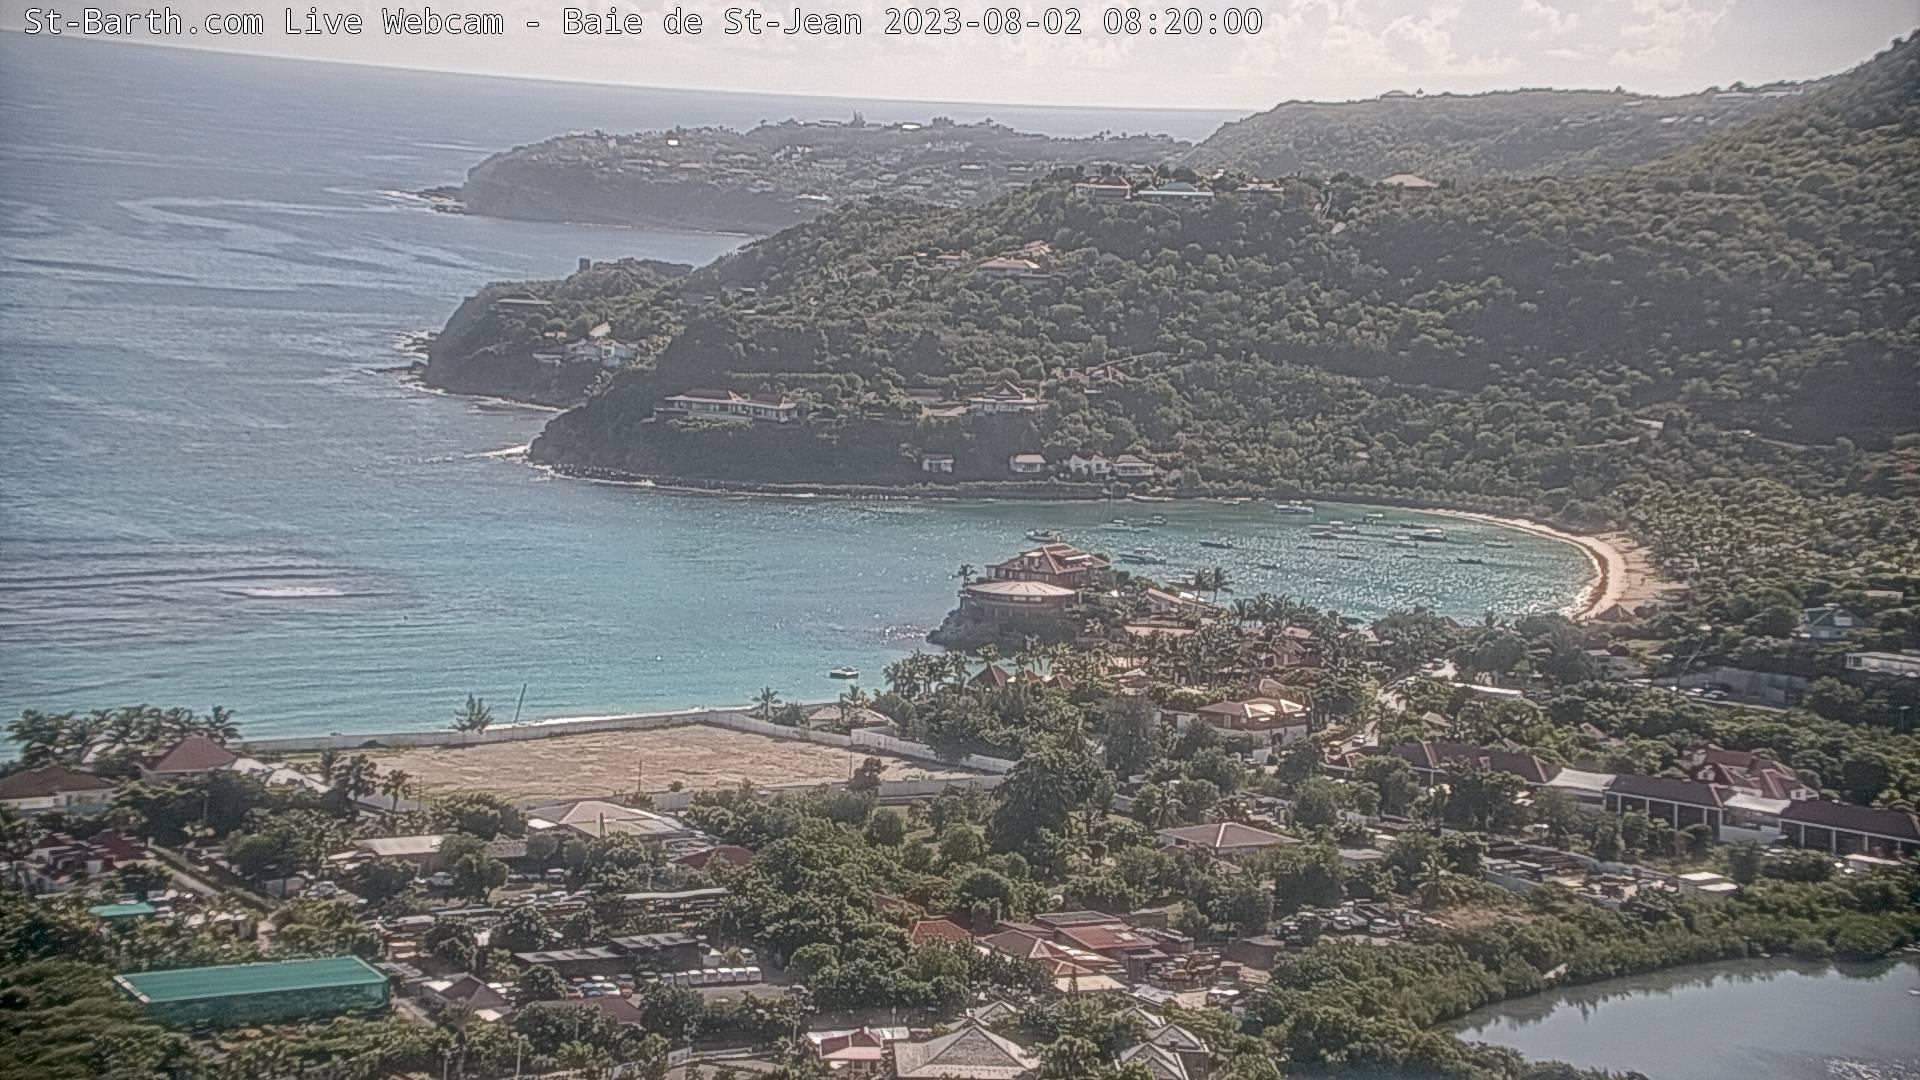 webcam St-Barth - Baie de Saint Jean